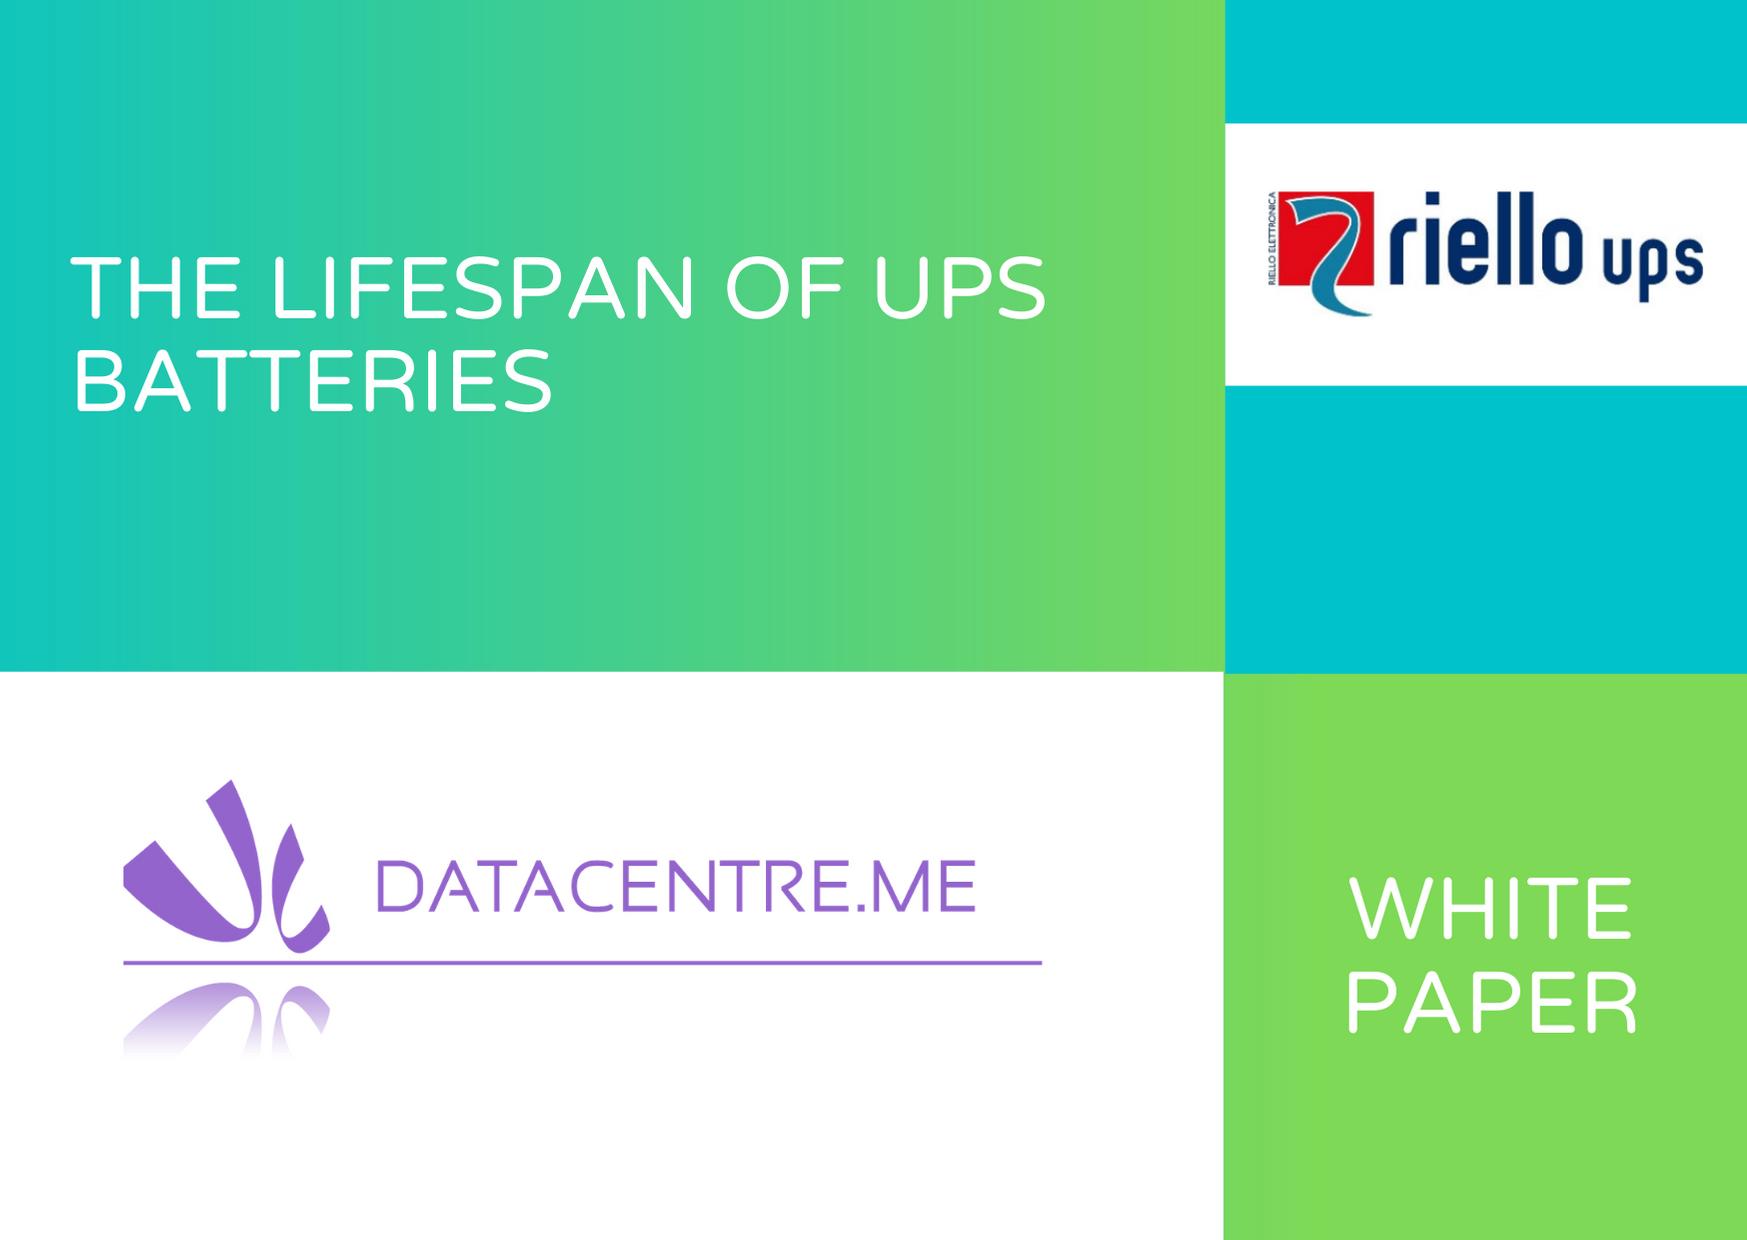 Riello White Paper lifespan of UPS batteries